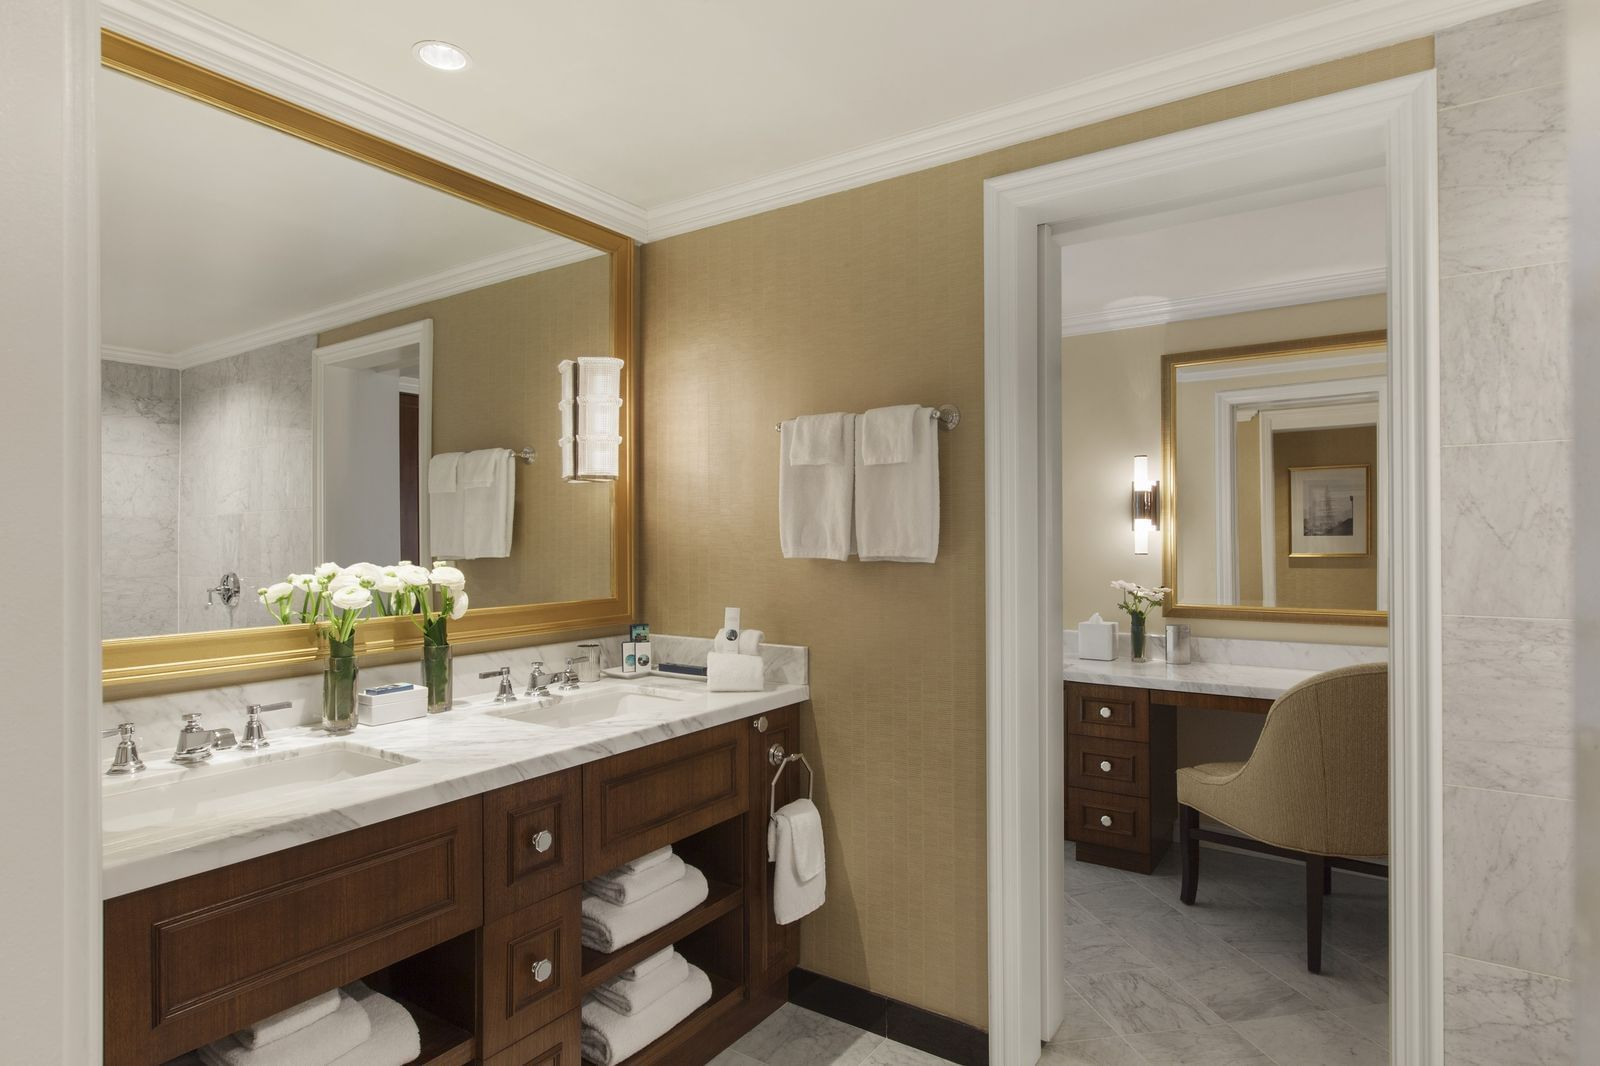 Expansive hotel bathroom